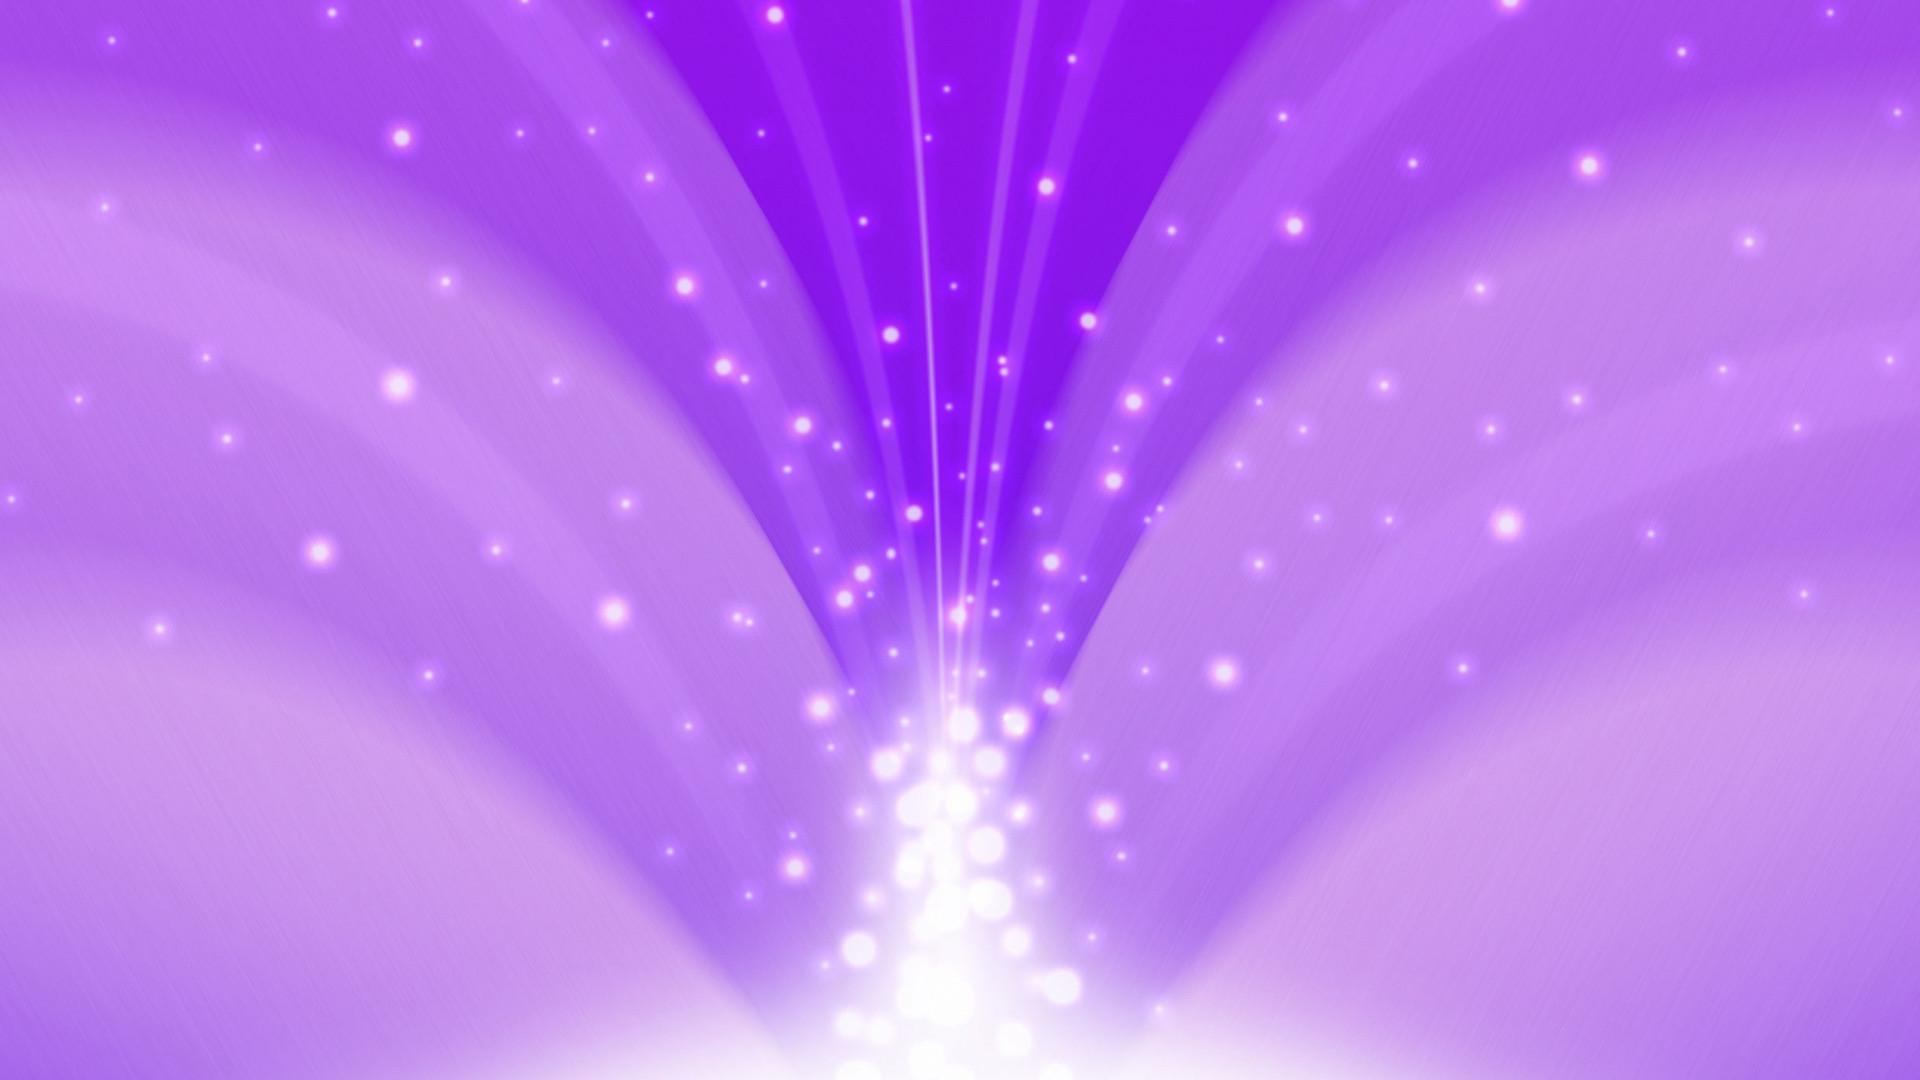 Simple Light Purple Wallpaper